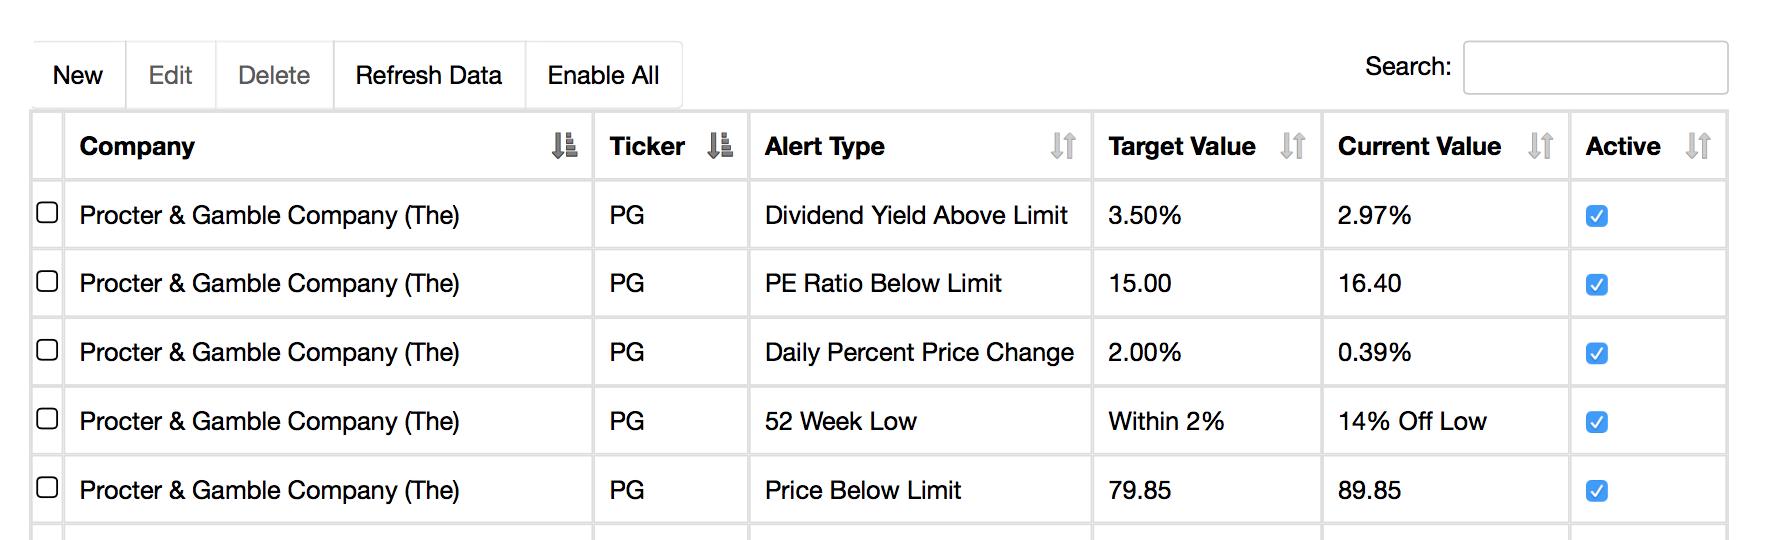 Procter & Gamble Stock Quote Procter & Gamble Review Plus Q1 Portfolio Update  The Procter